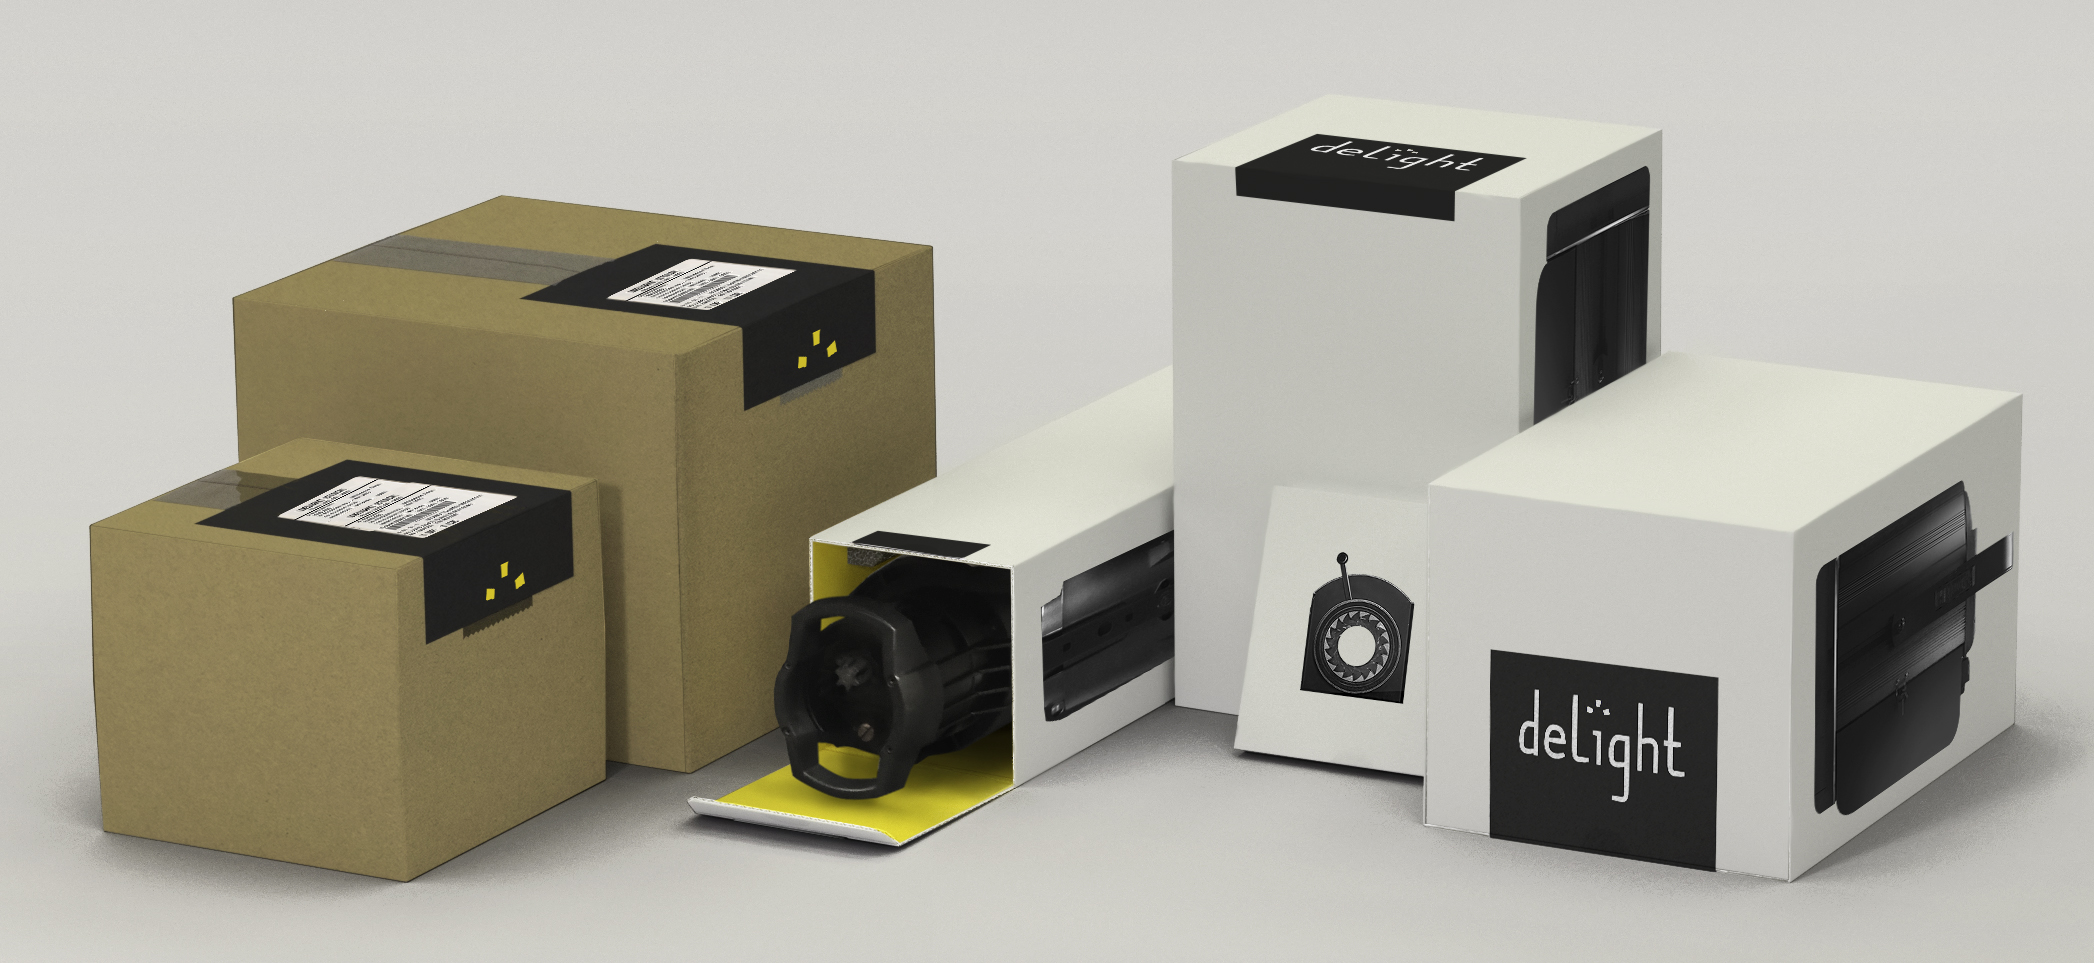 michael-j-reedy-delight-boxes.jpg